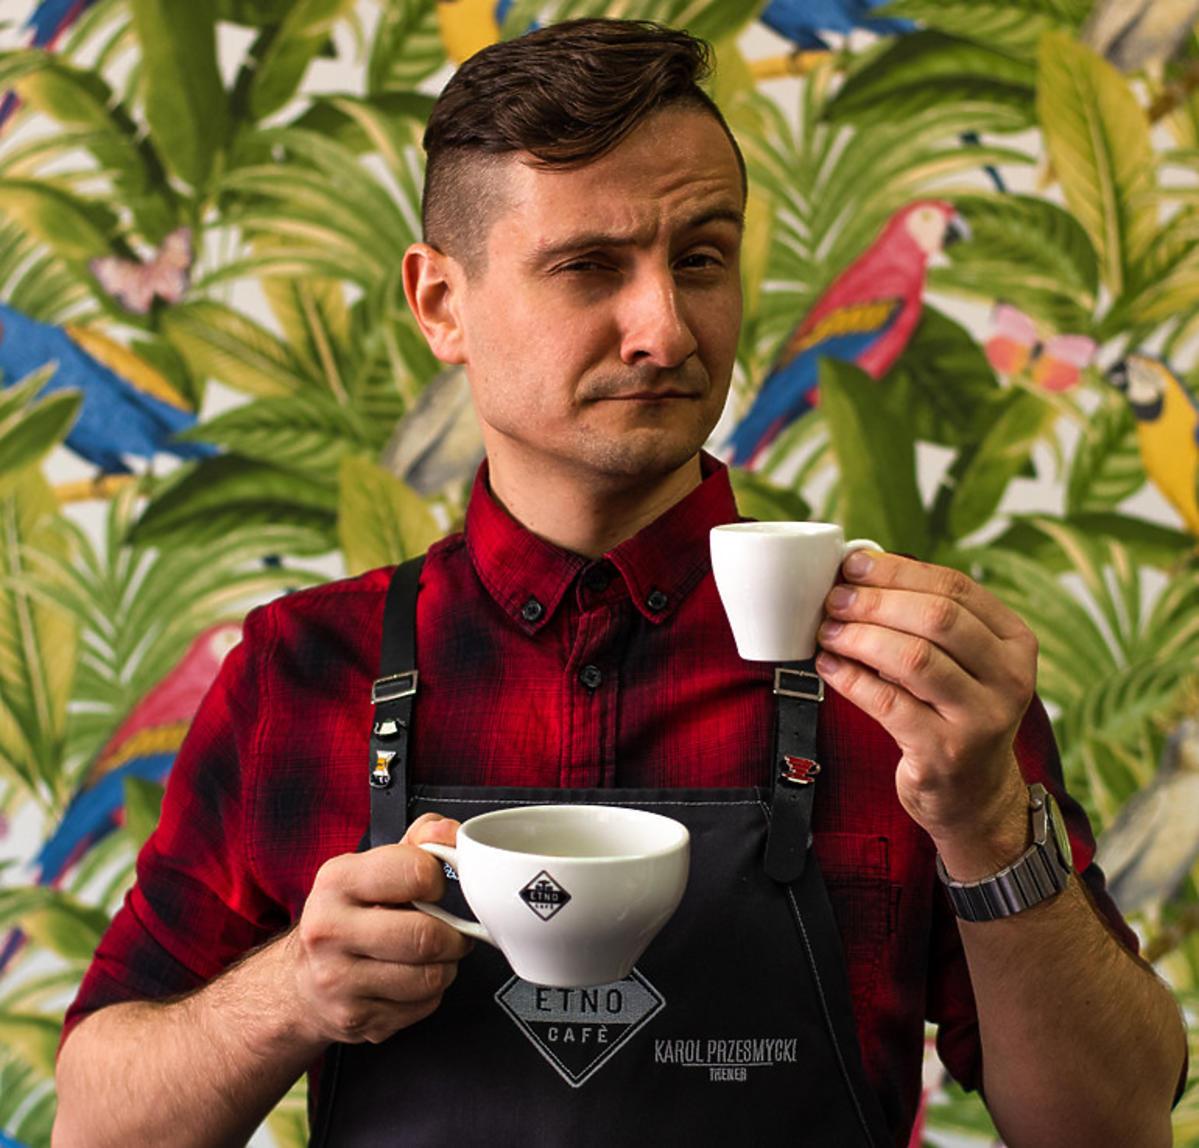 Karol Przesmycki, Trener Baristów Etno Cafe